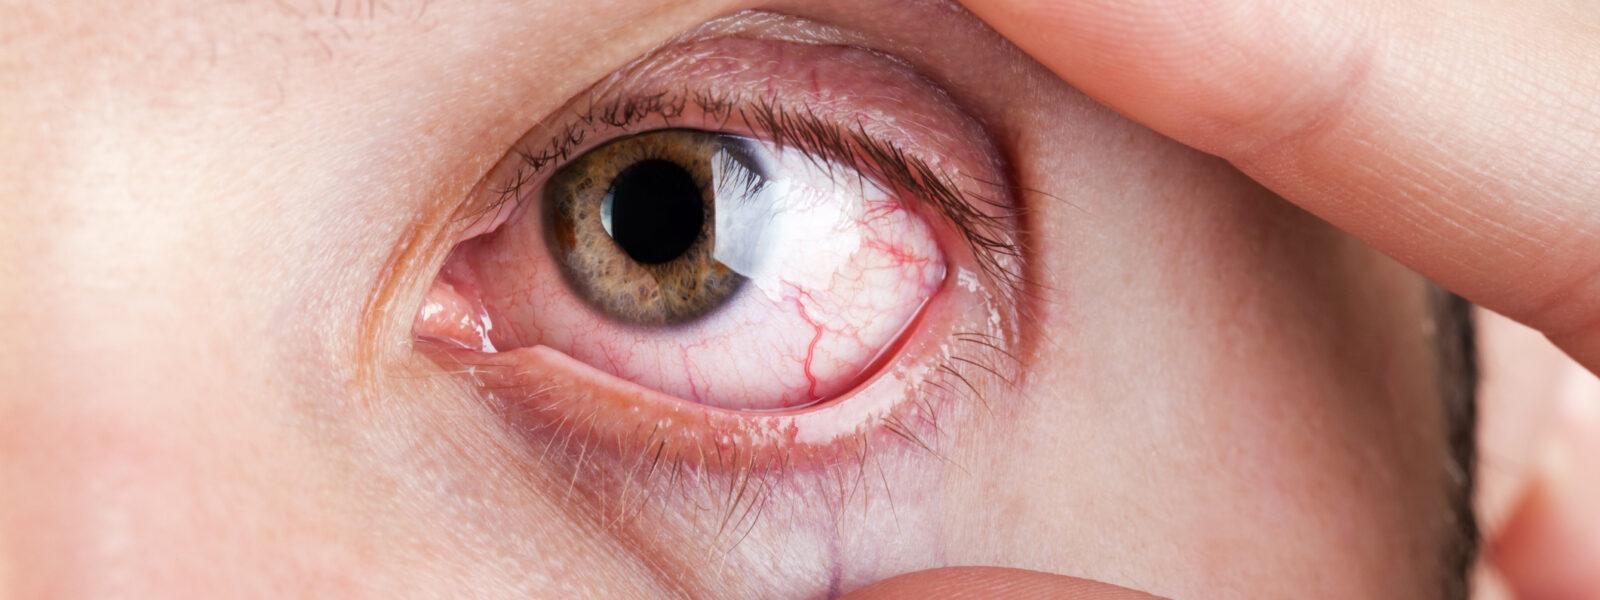 Vista cansada: quais os sinais e como se pode evitar